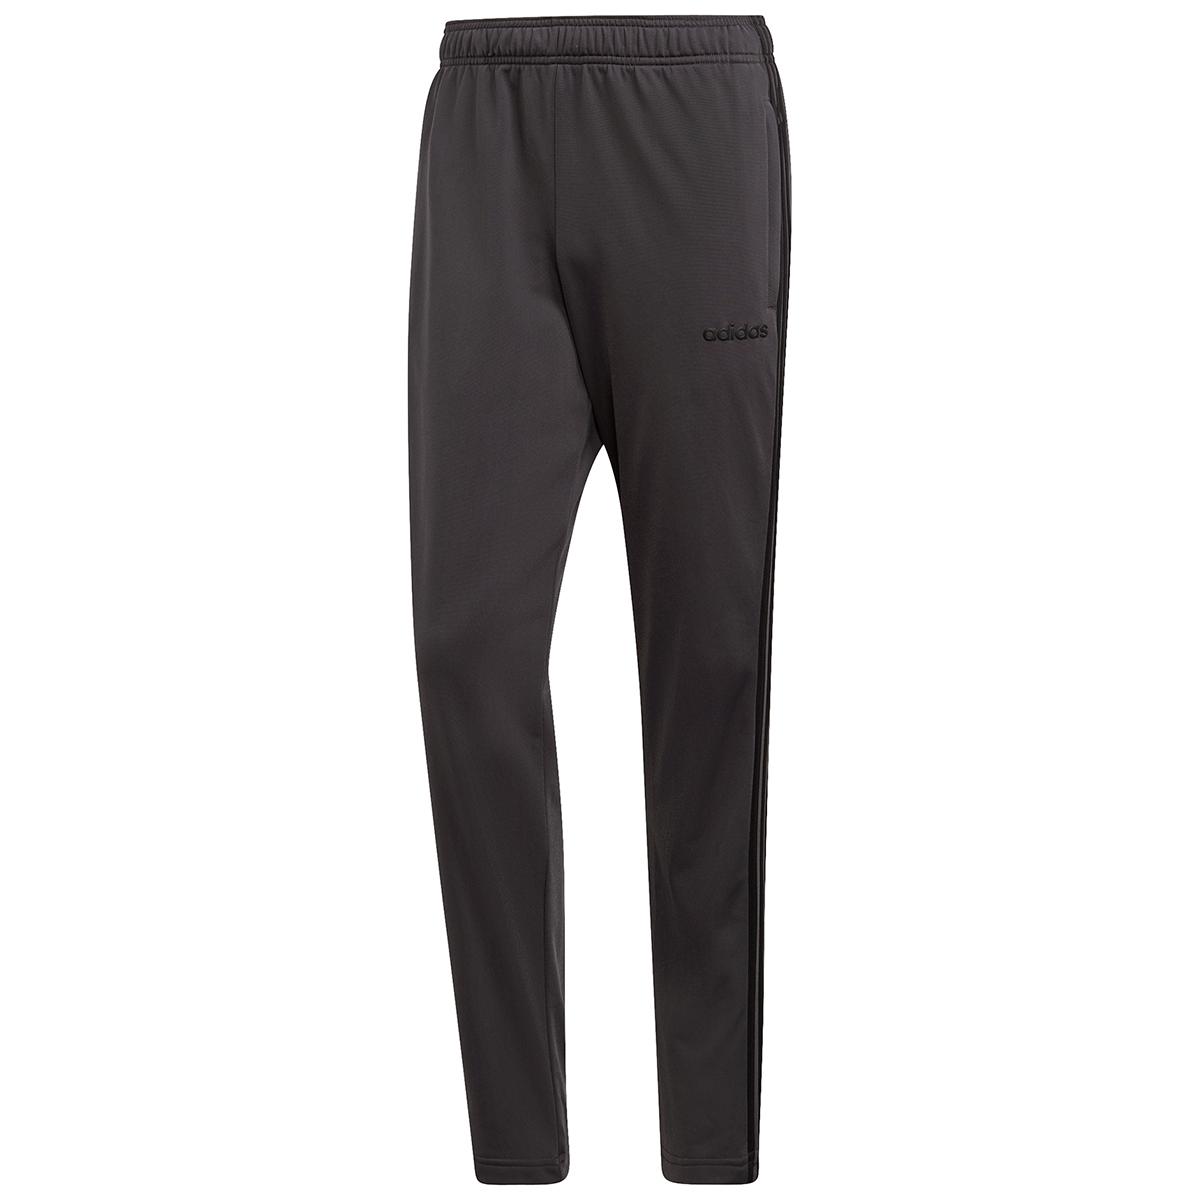 Adidas Men's 3-Stripe Wind Pants - Black, XXL